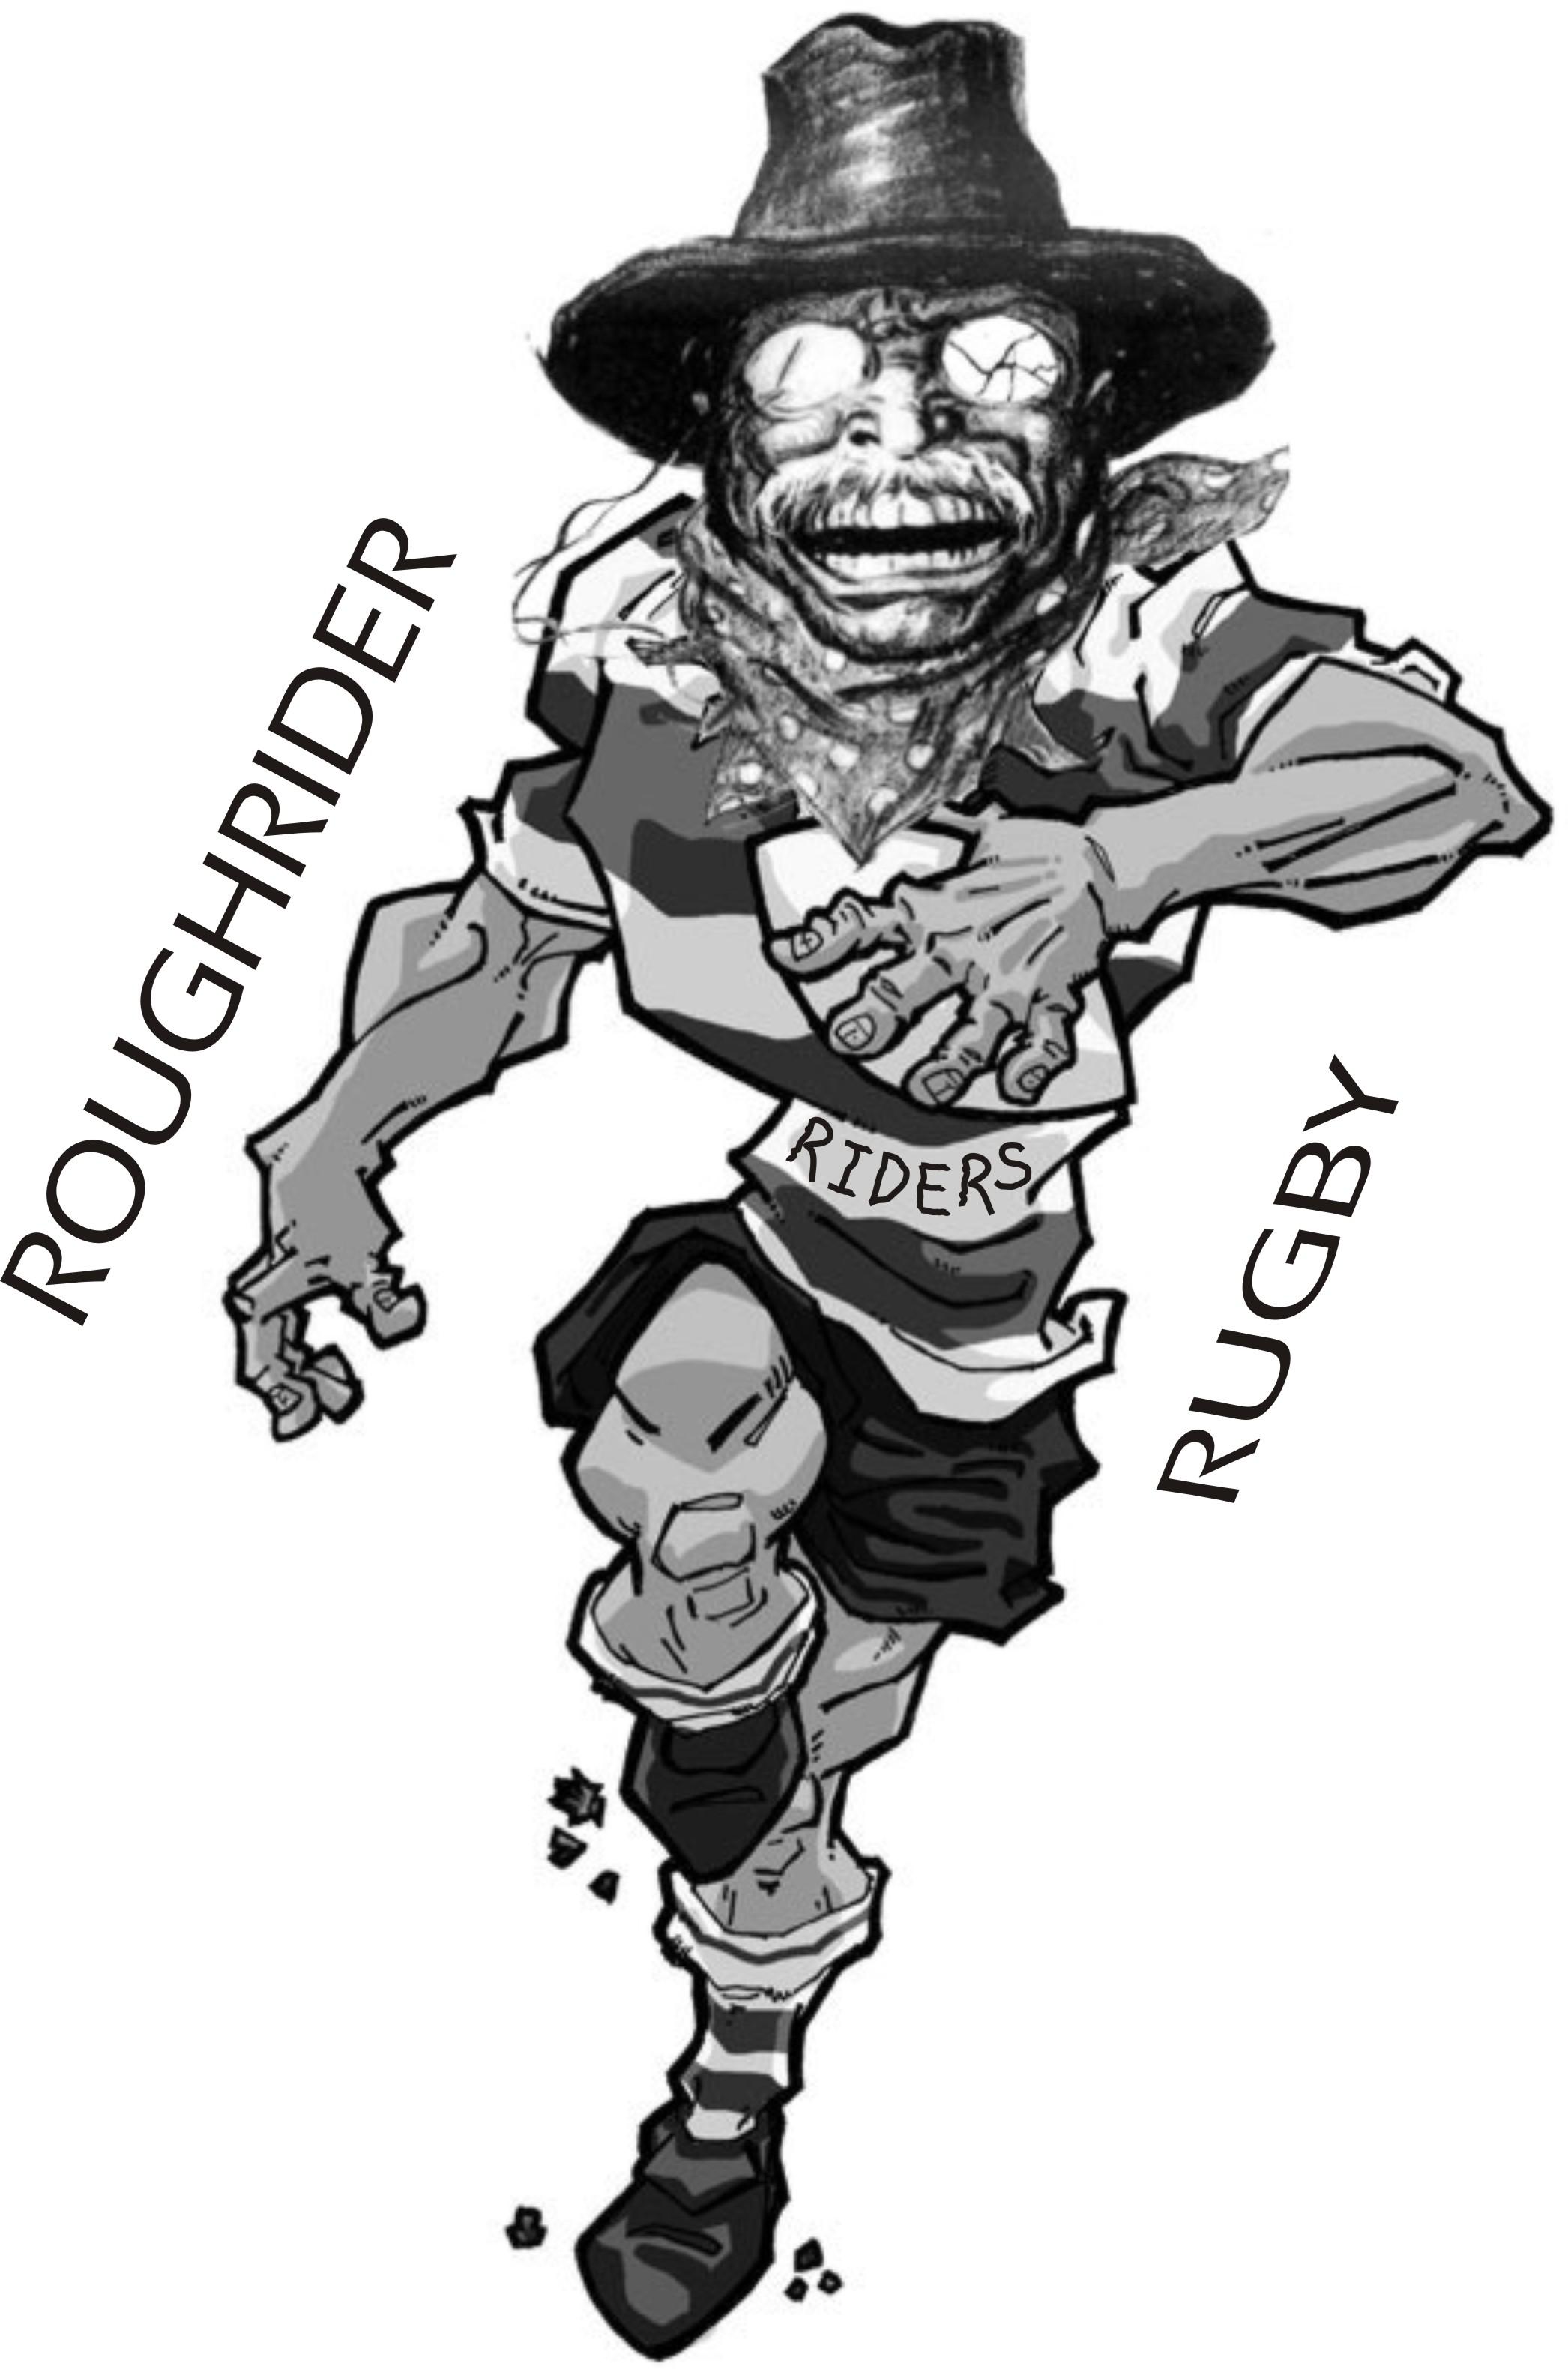 roughrider-rugby.jpg